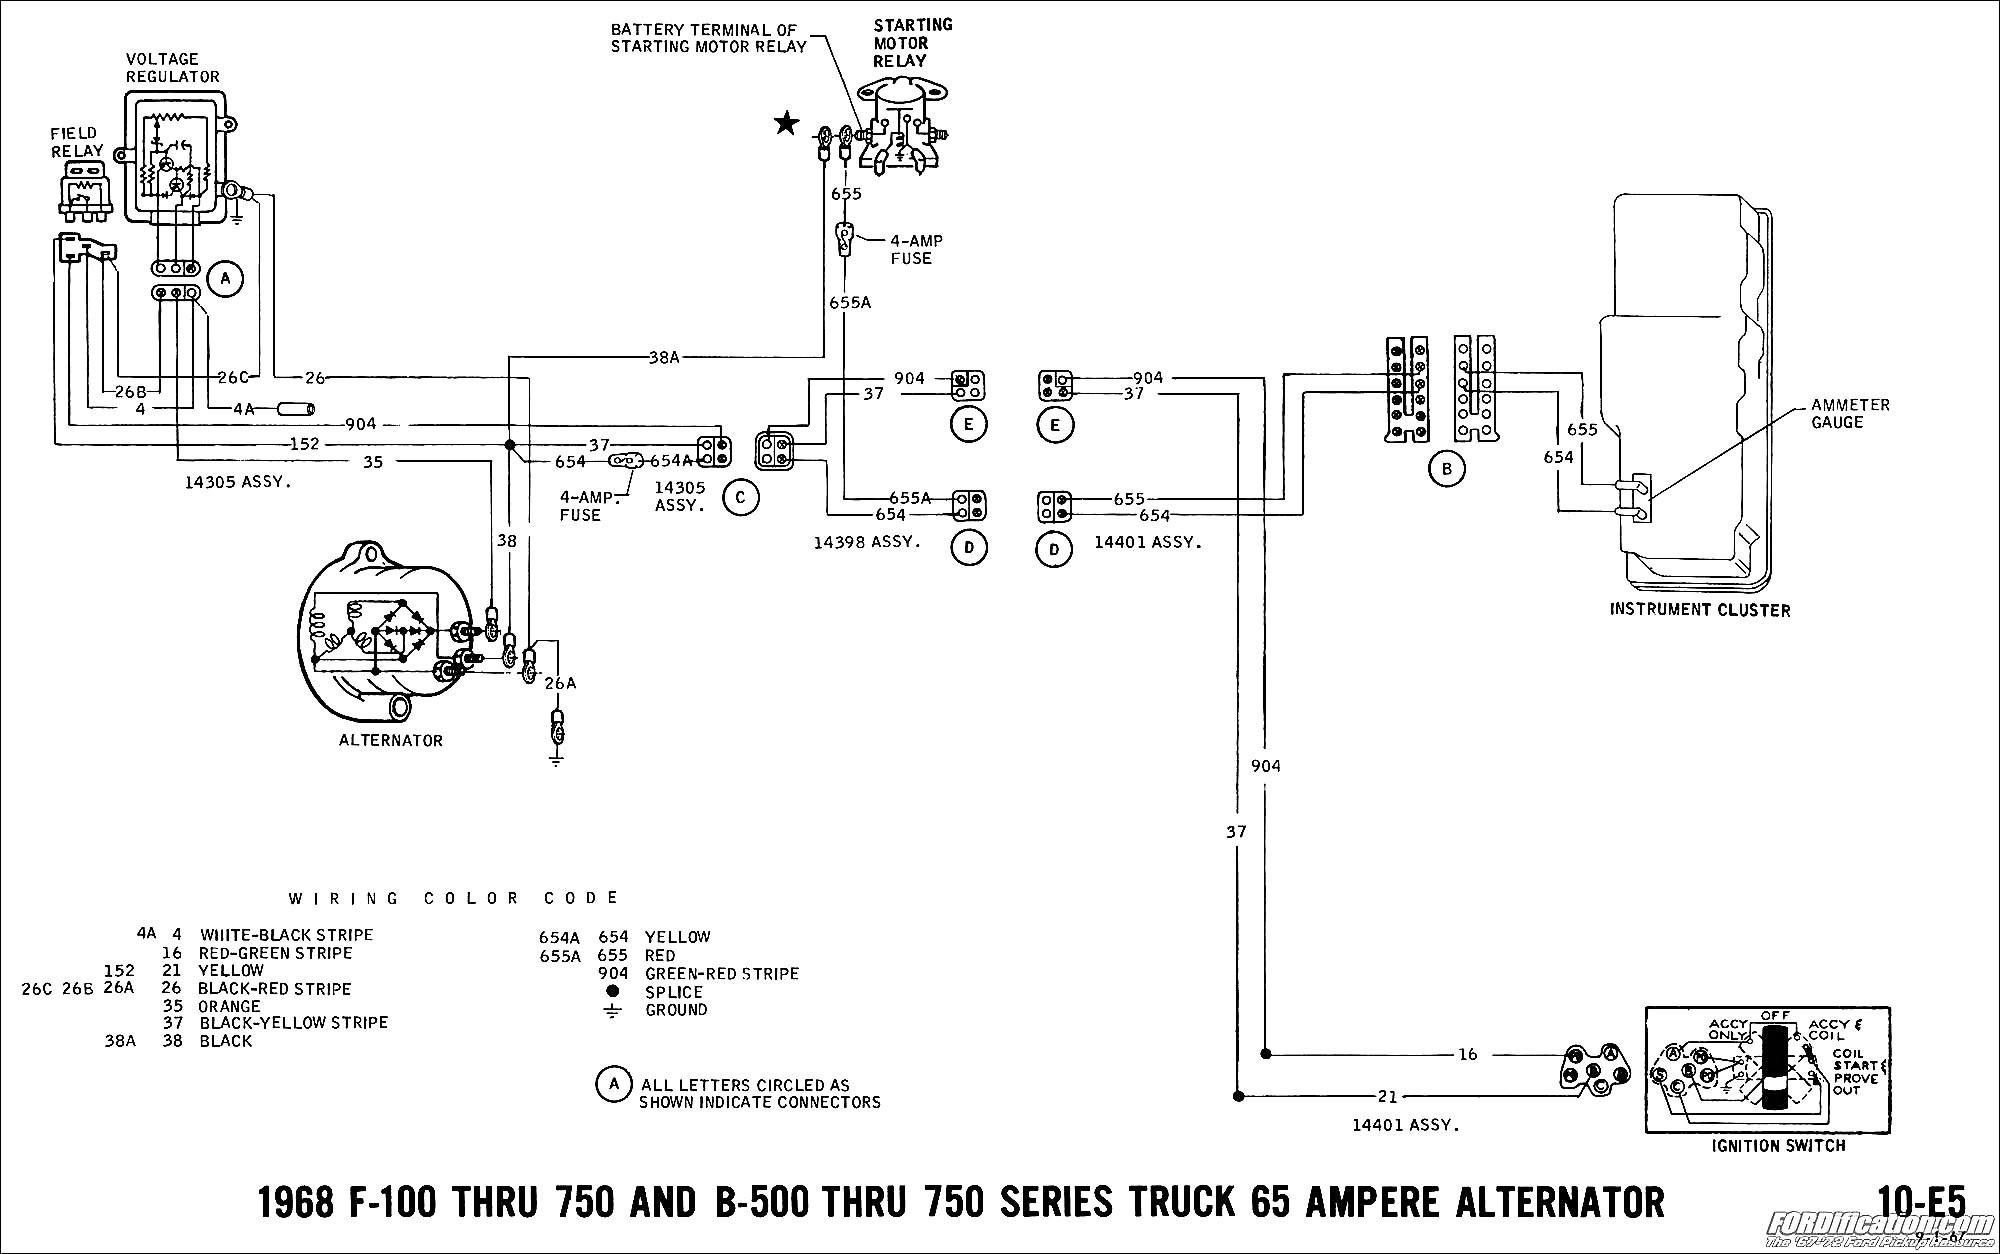 Wiring Diagram For International 434 TractorWiring Diagram